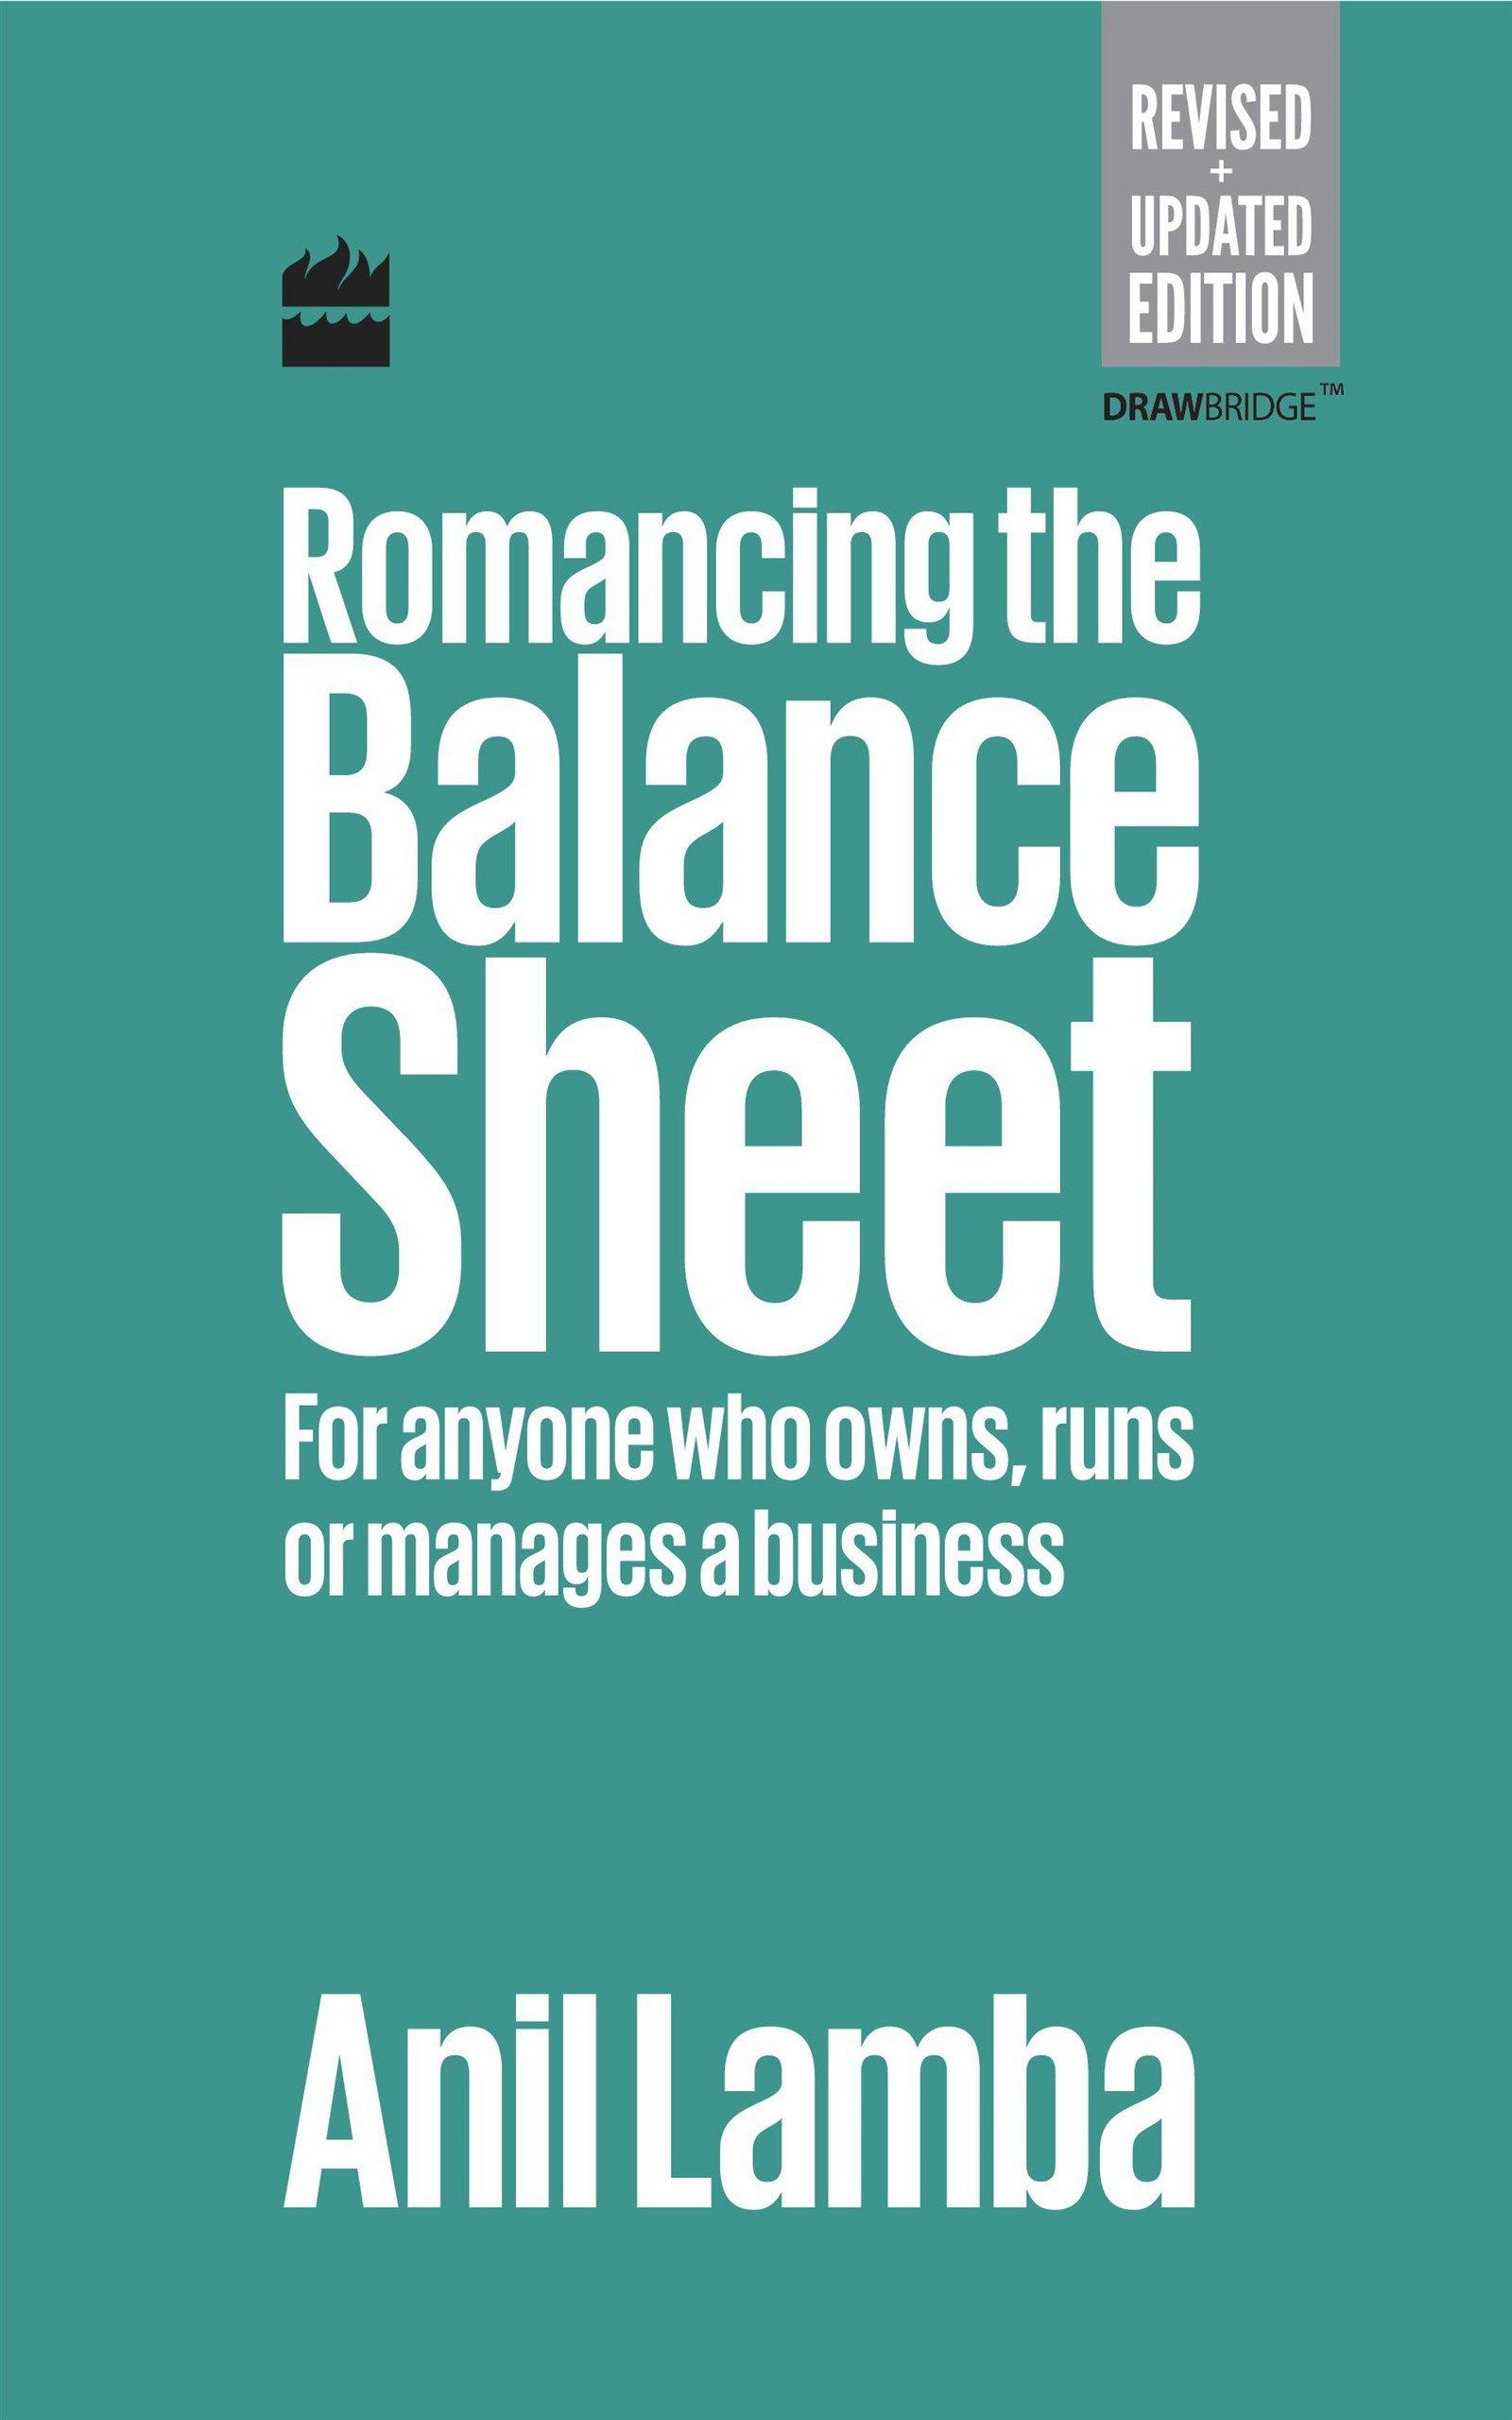 Romancing the Balance Sheet | Money | Investment